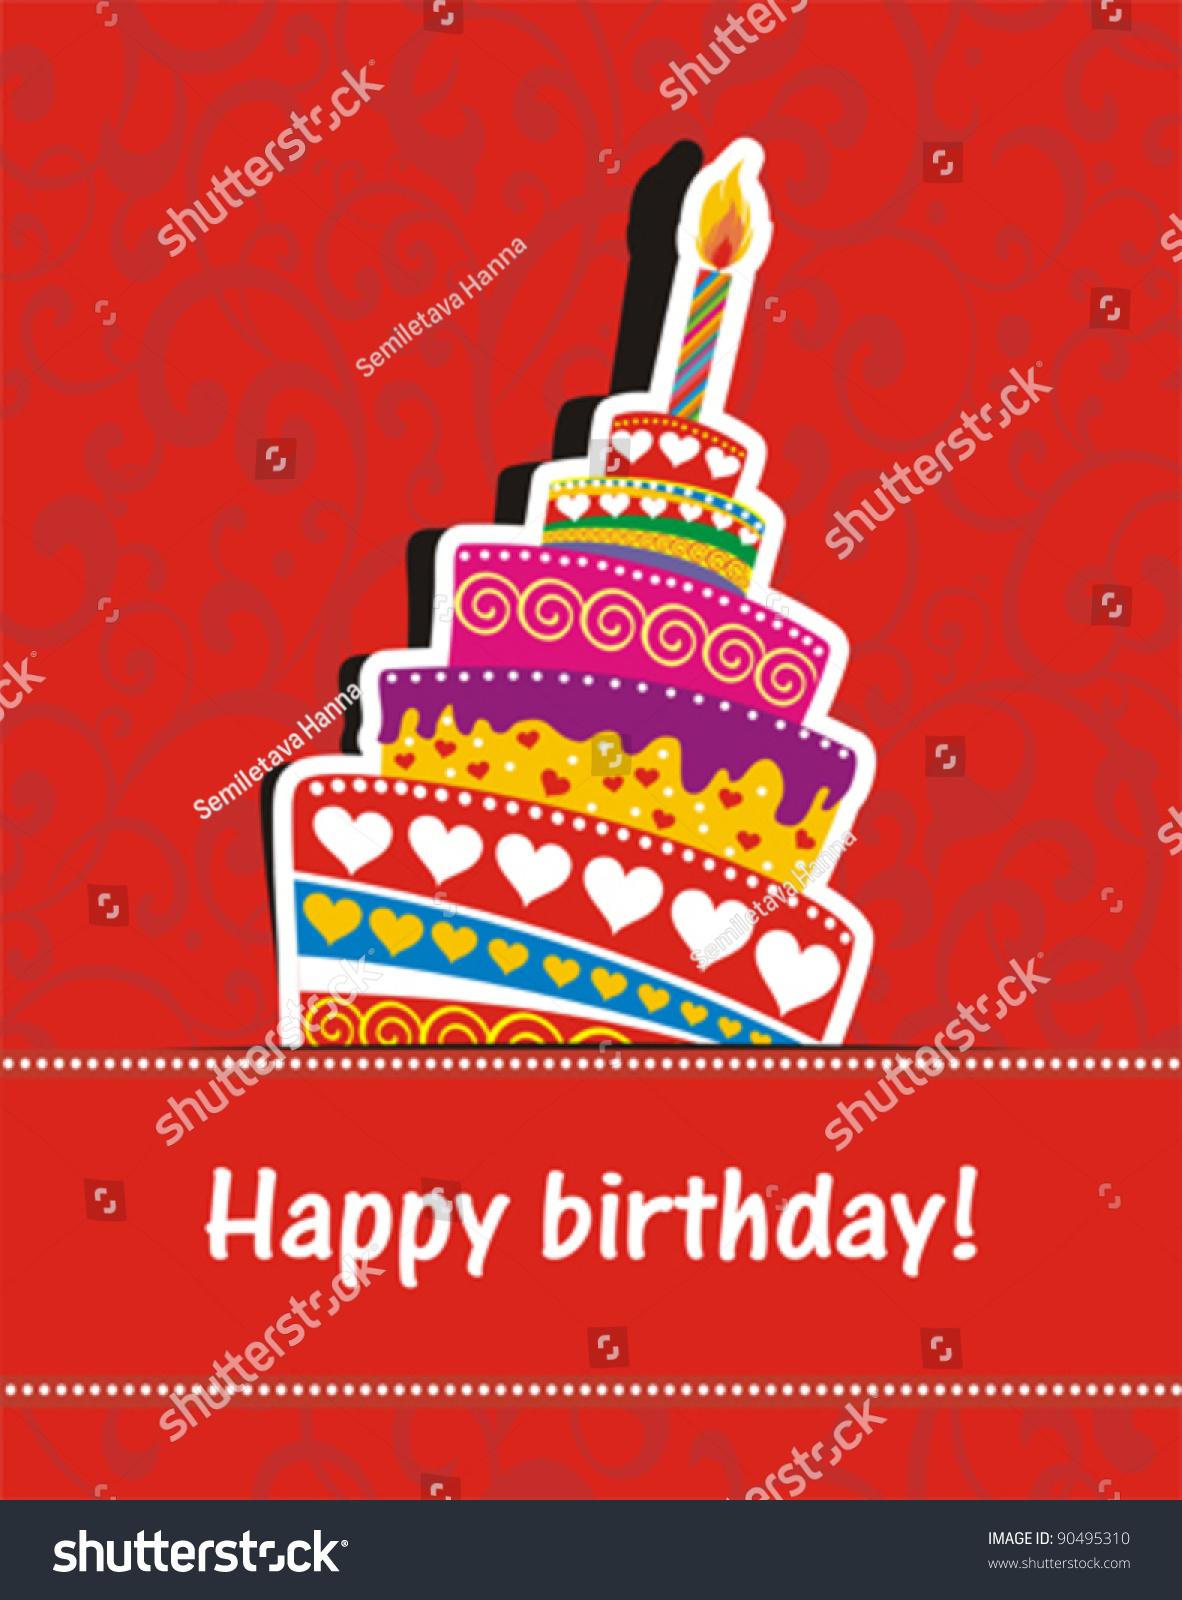 vector happy birthday card birthday cake stock vector, Birthday card